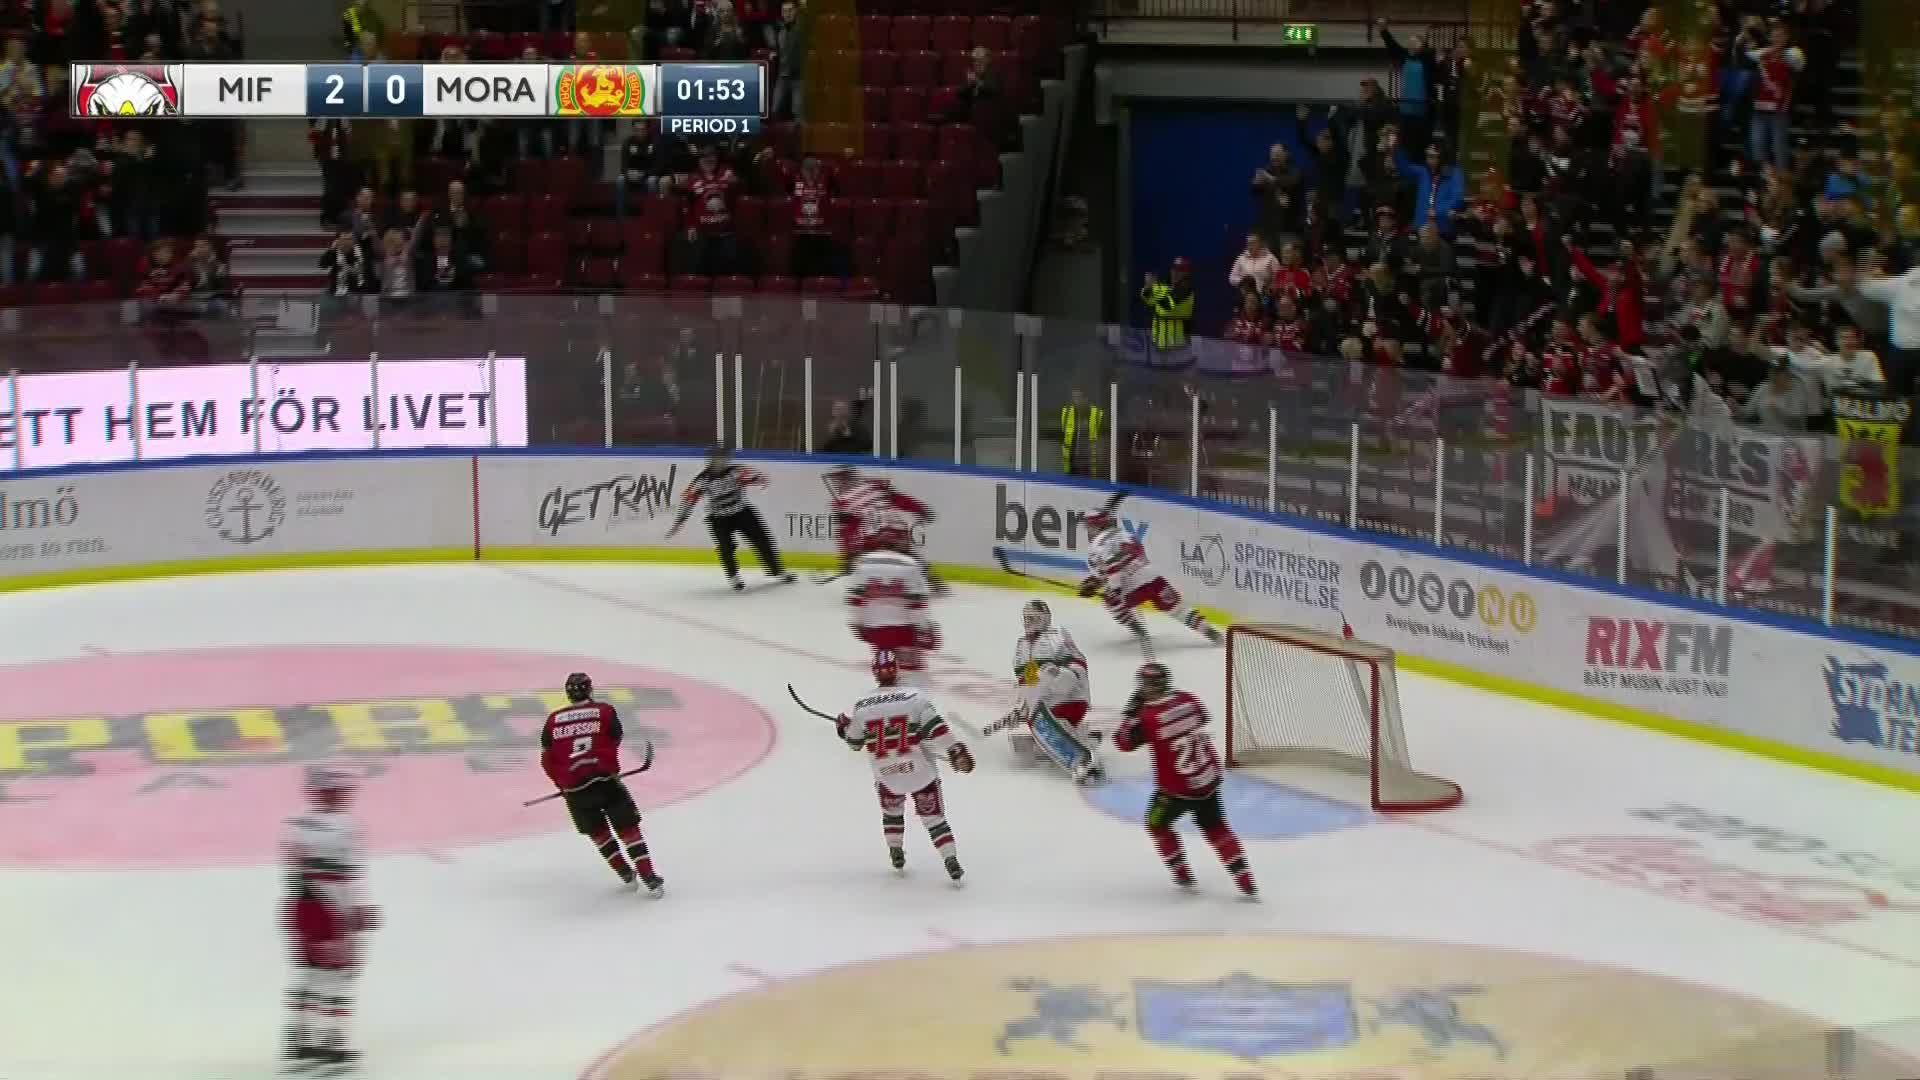 Malmö Redhawks - Mora IK 3-0